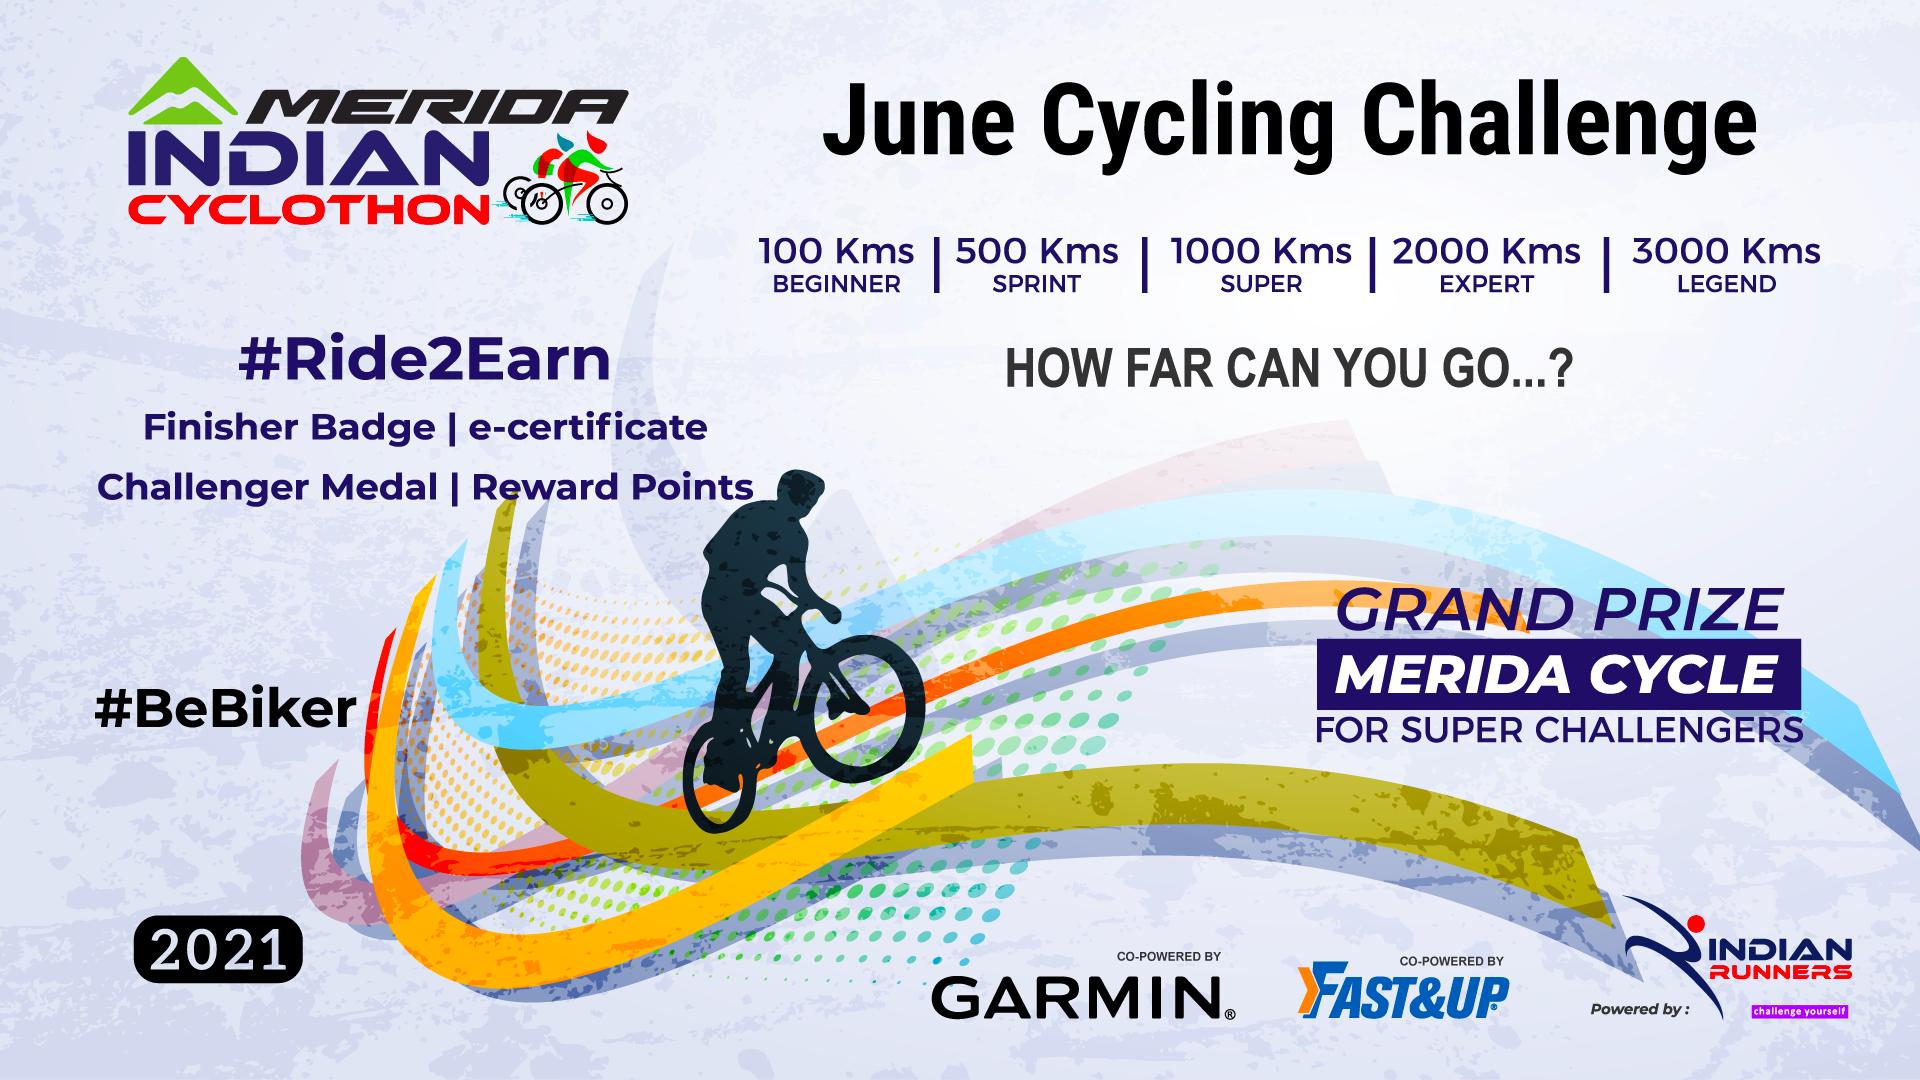 July Cycling Challenge 2021 image